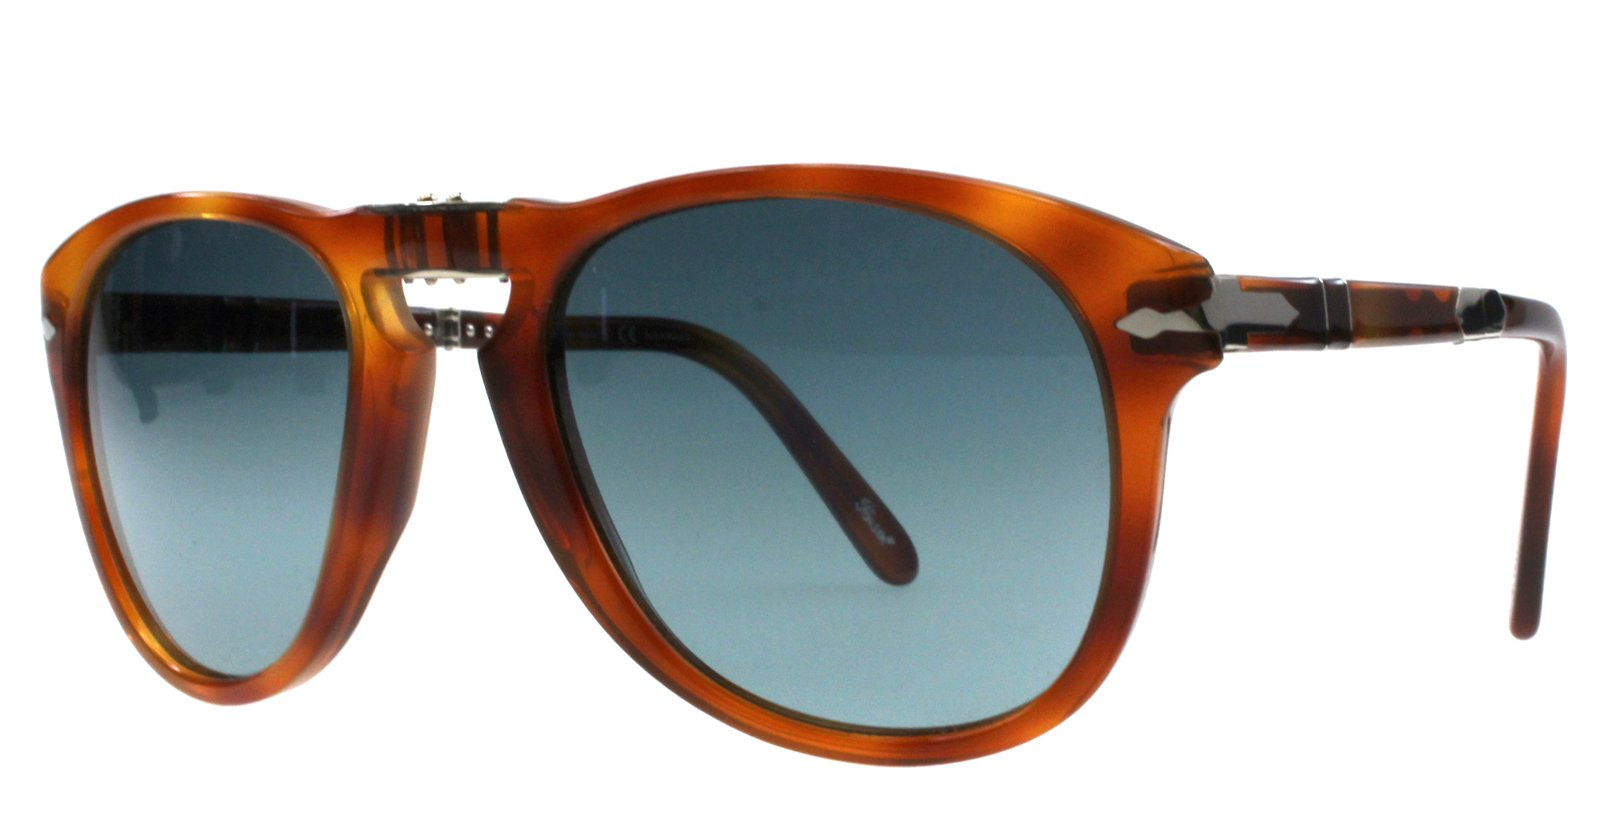 Persol Steve McQueen Polarized 714SM 96/S3 54mm  Folding Sunglasses Limited Edition Light Havana Crystal Gradient Blue